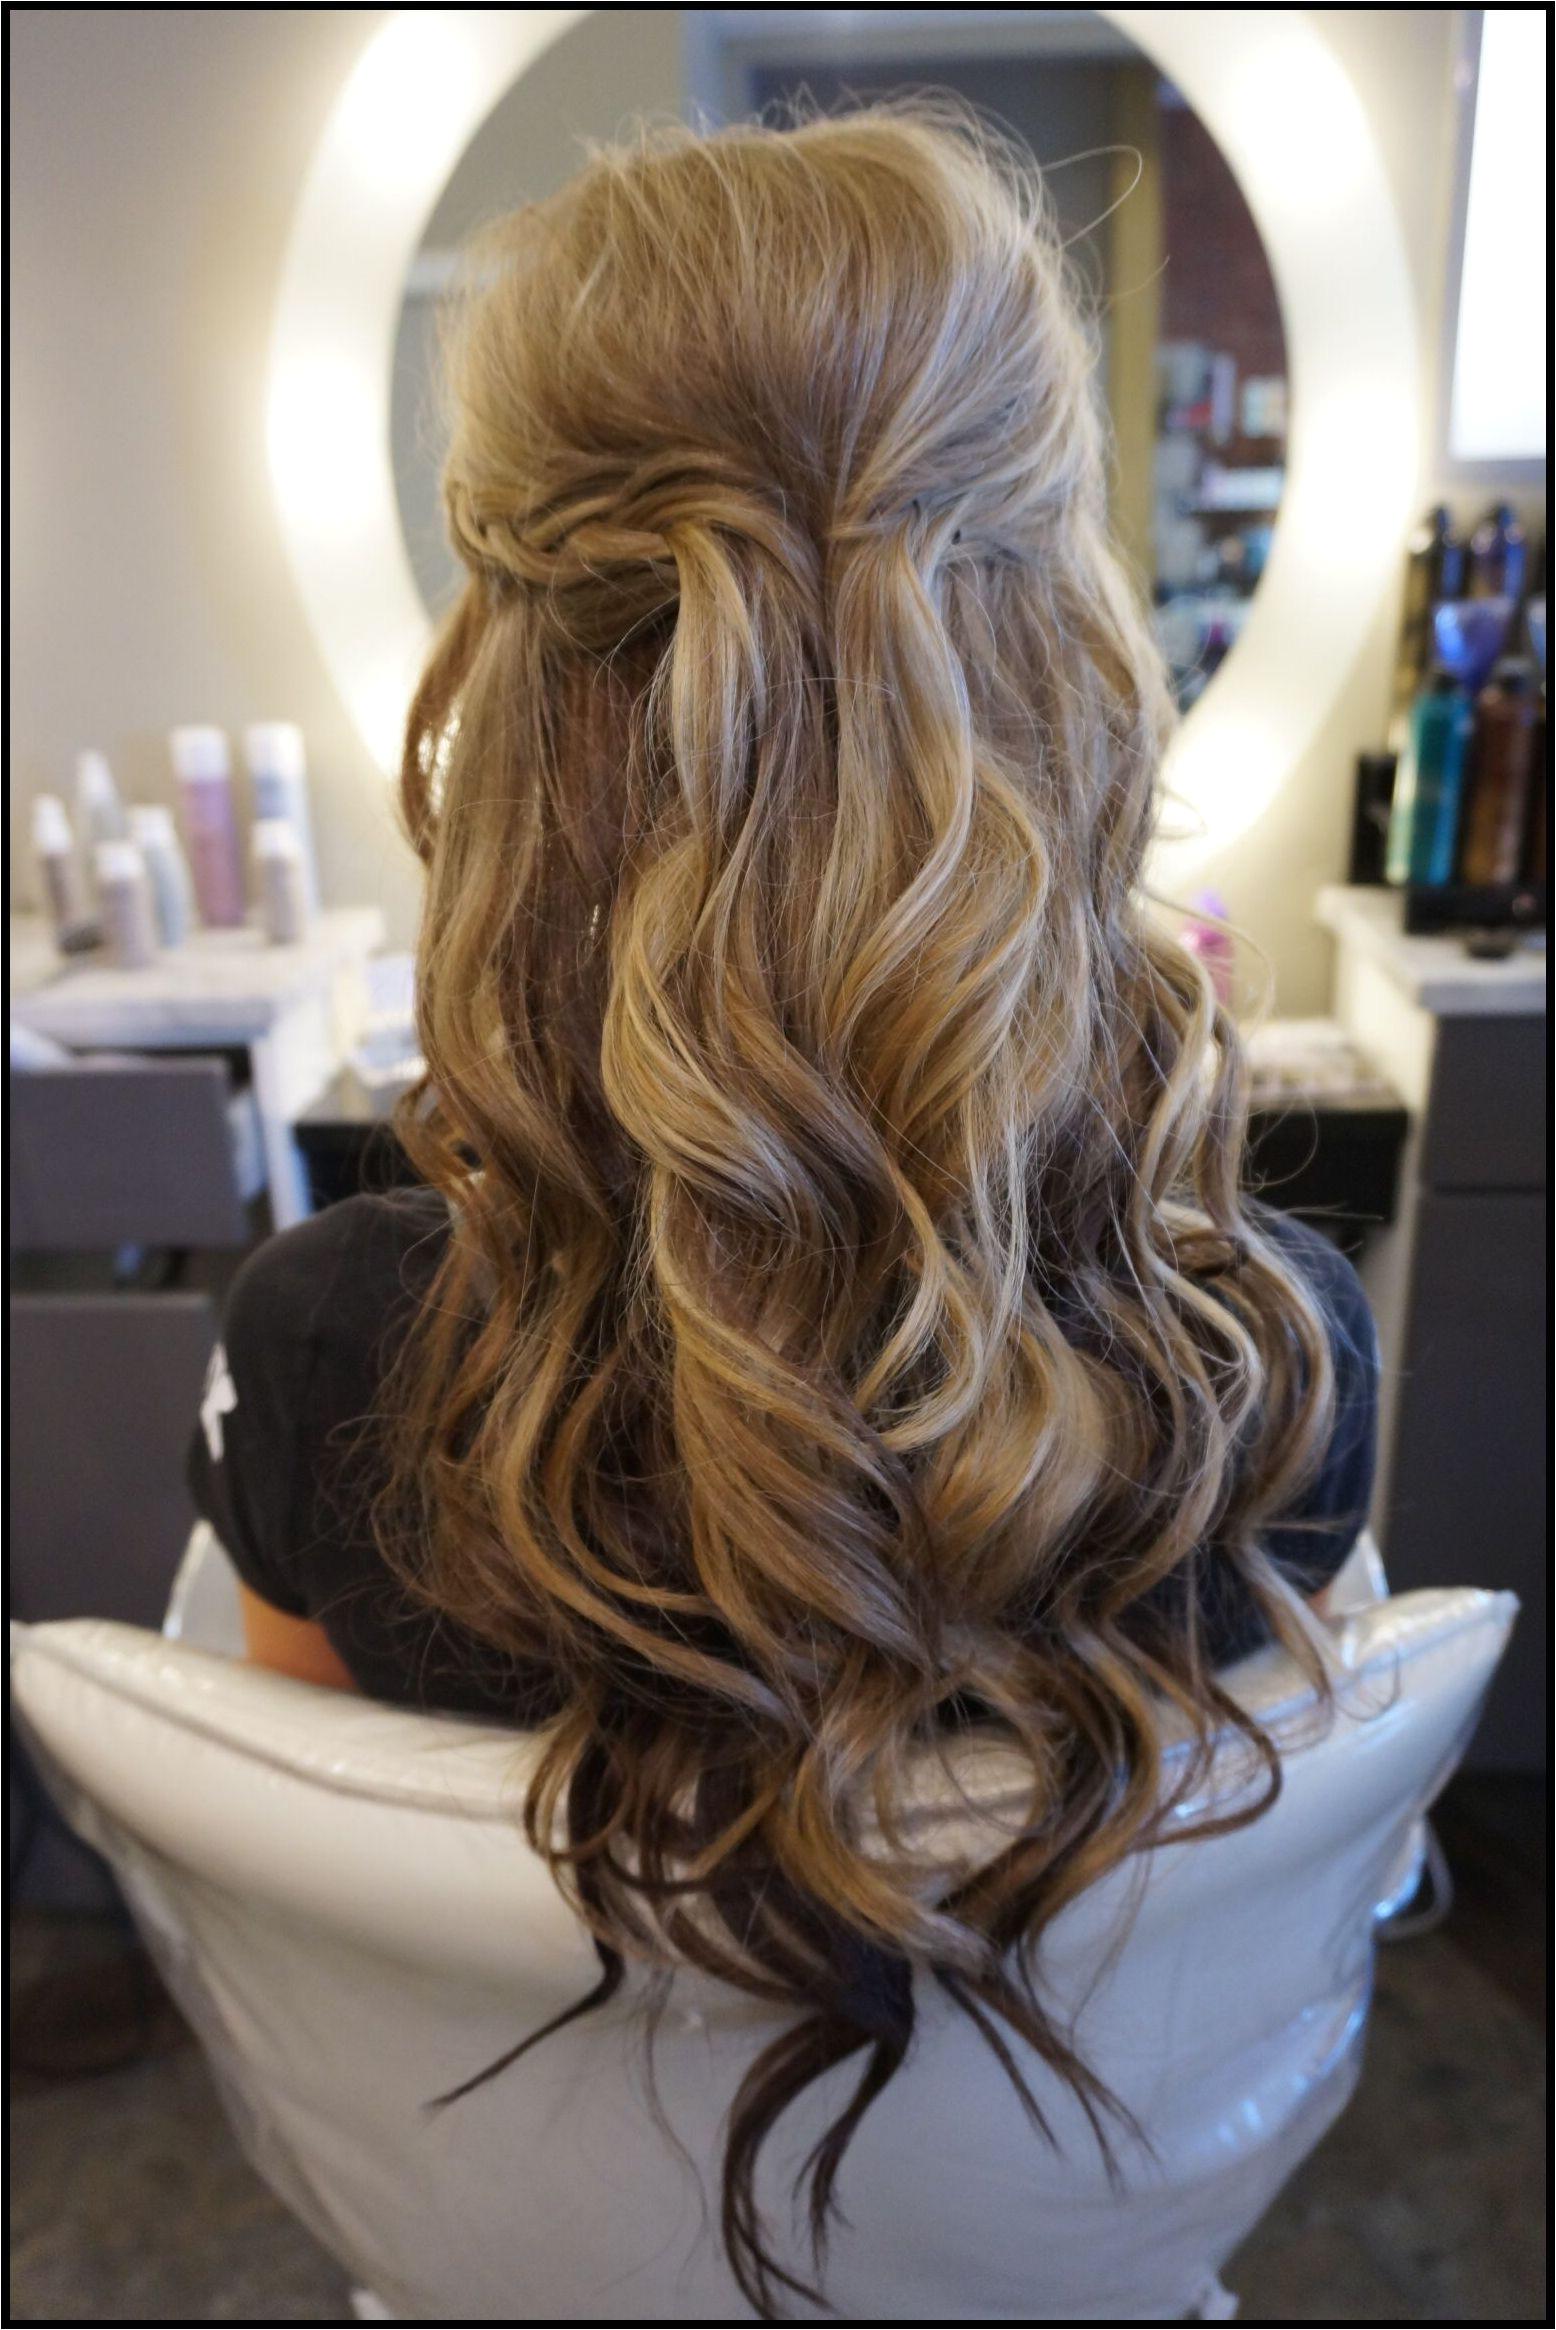 Luxus Home ing Frisuren für langes Haar